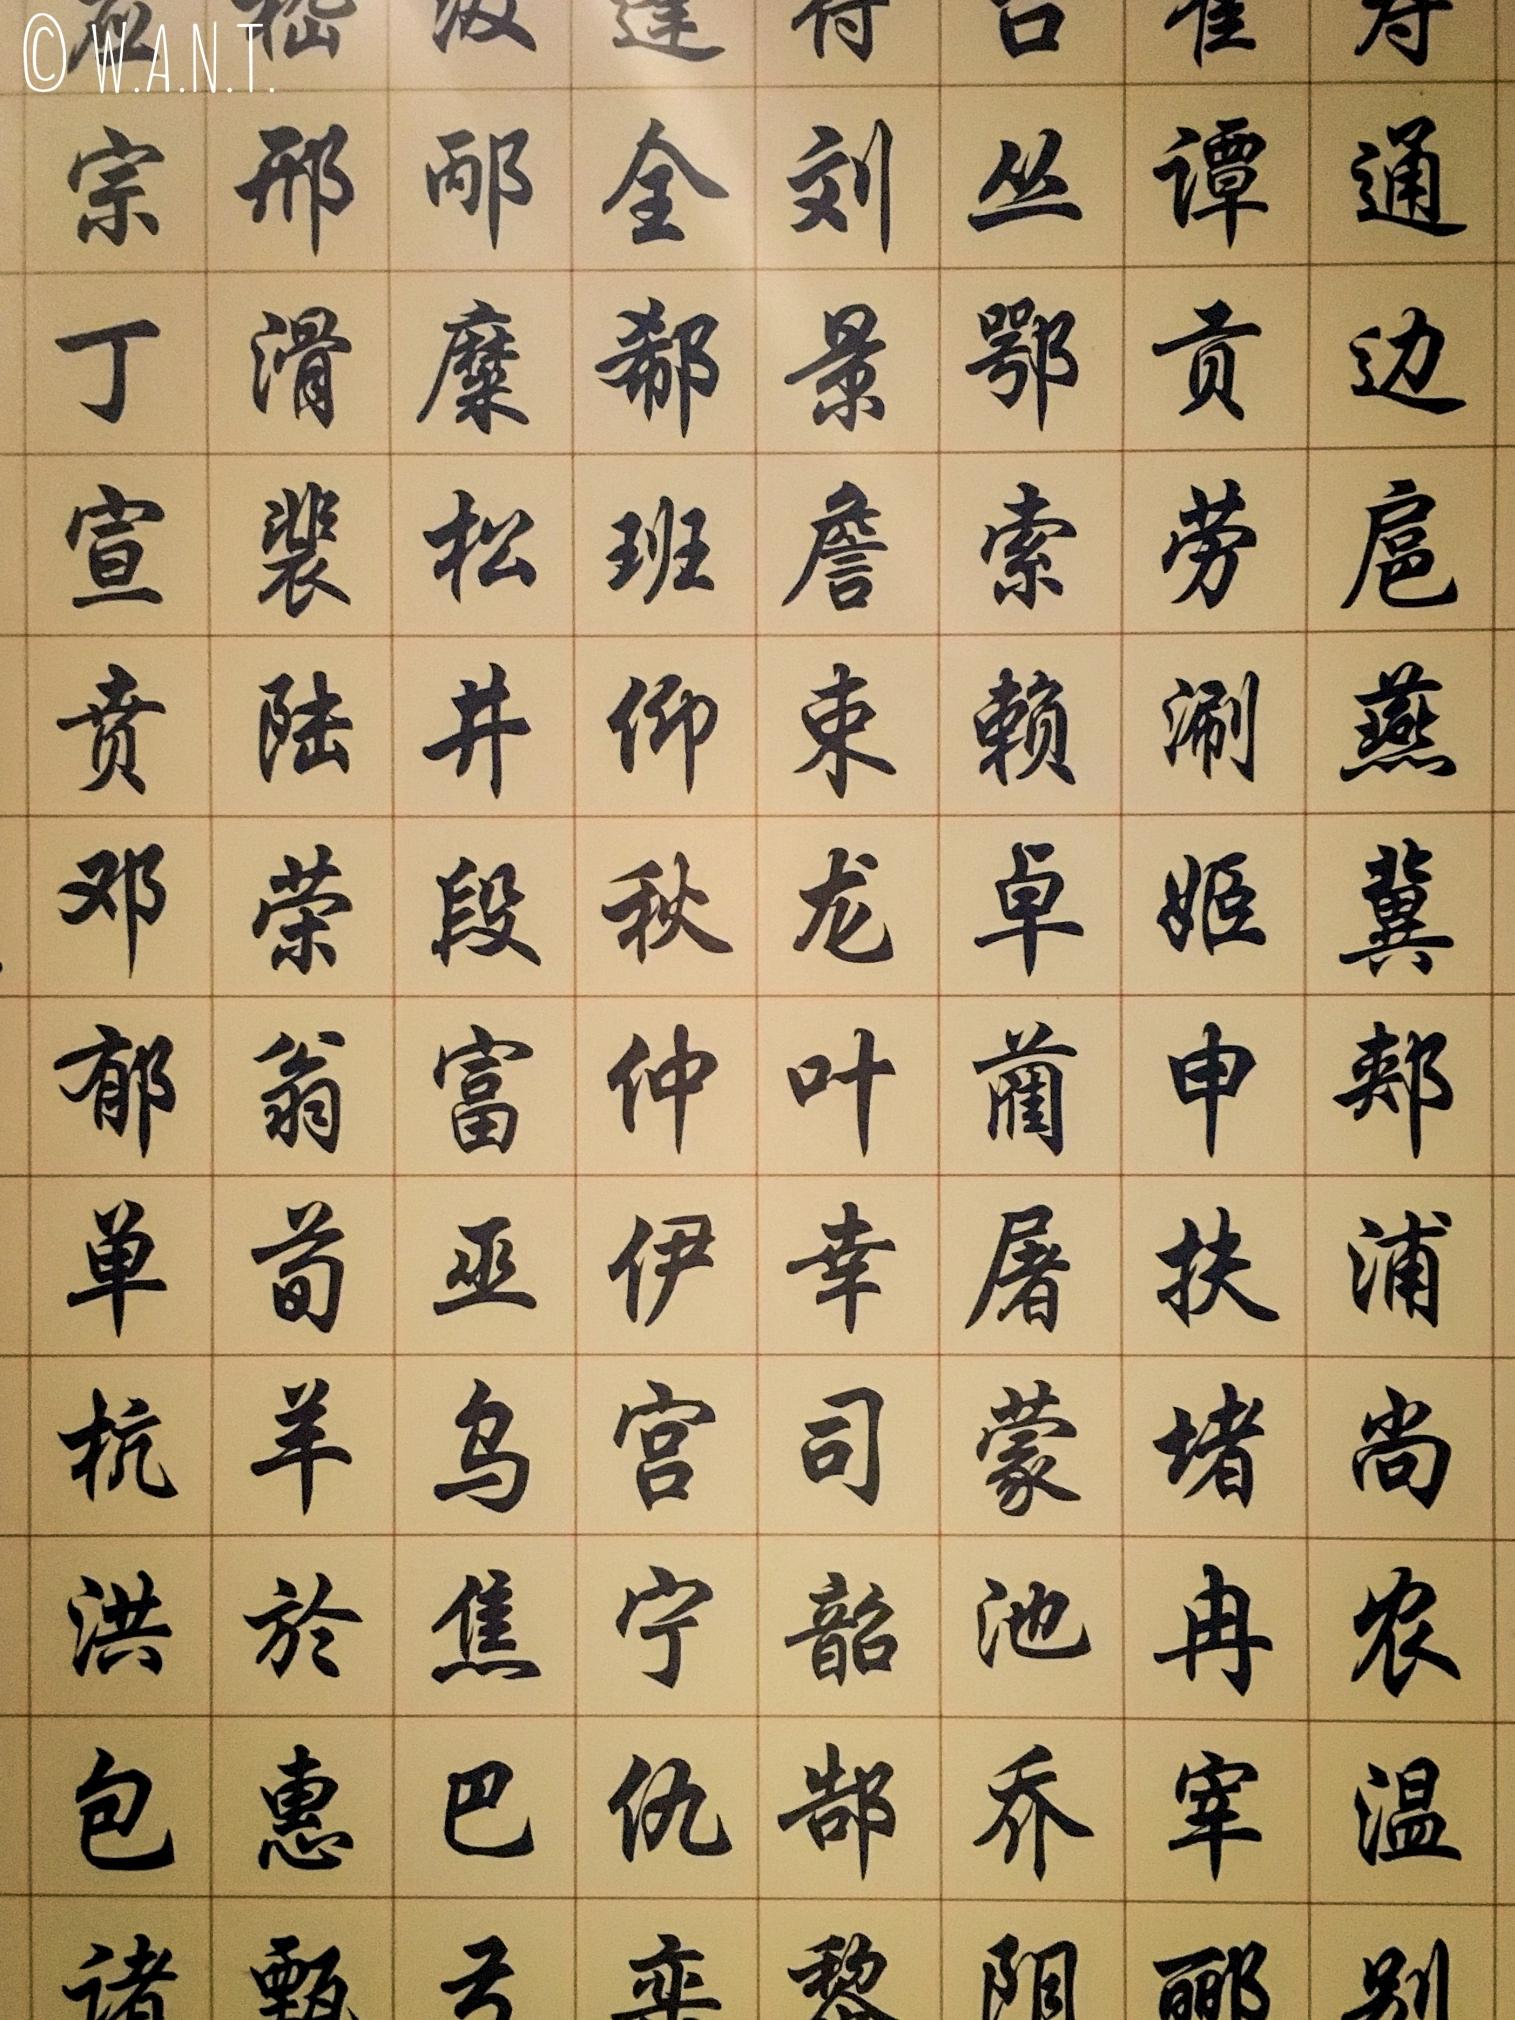 Graphisme chinois au Chinese History Museum de Kuching